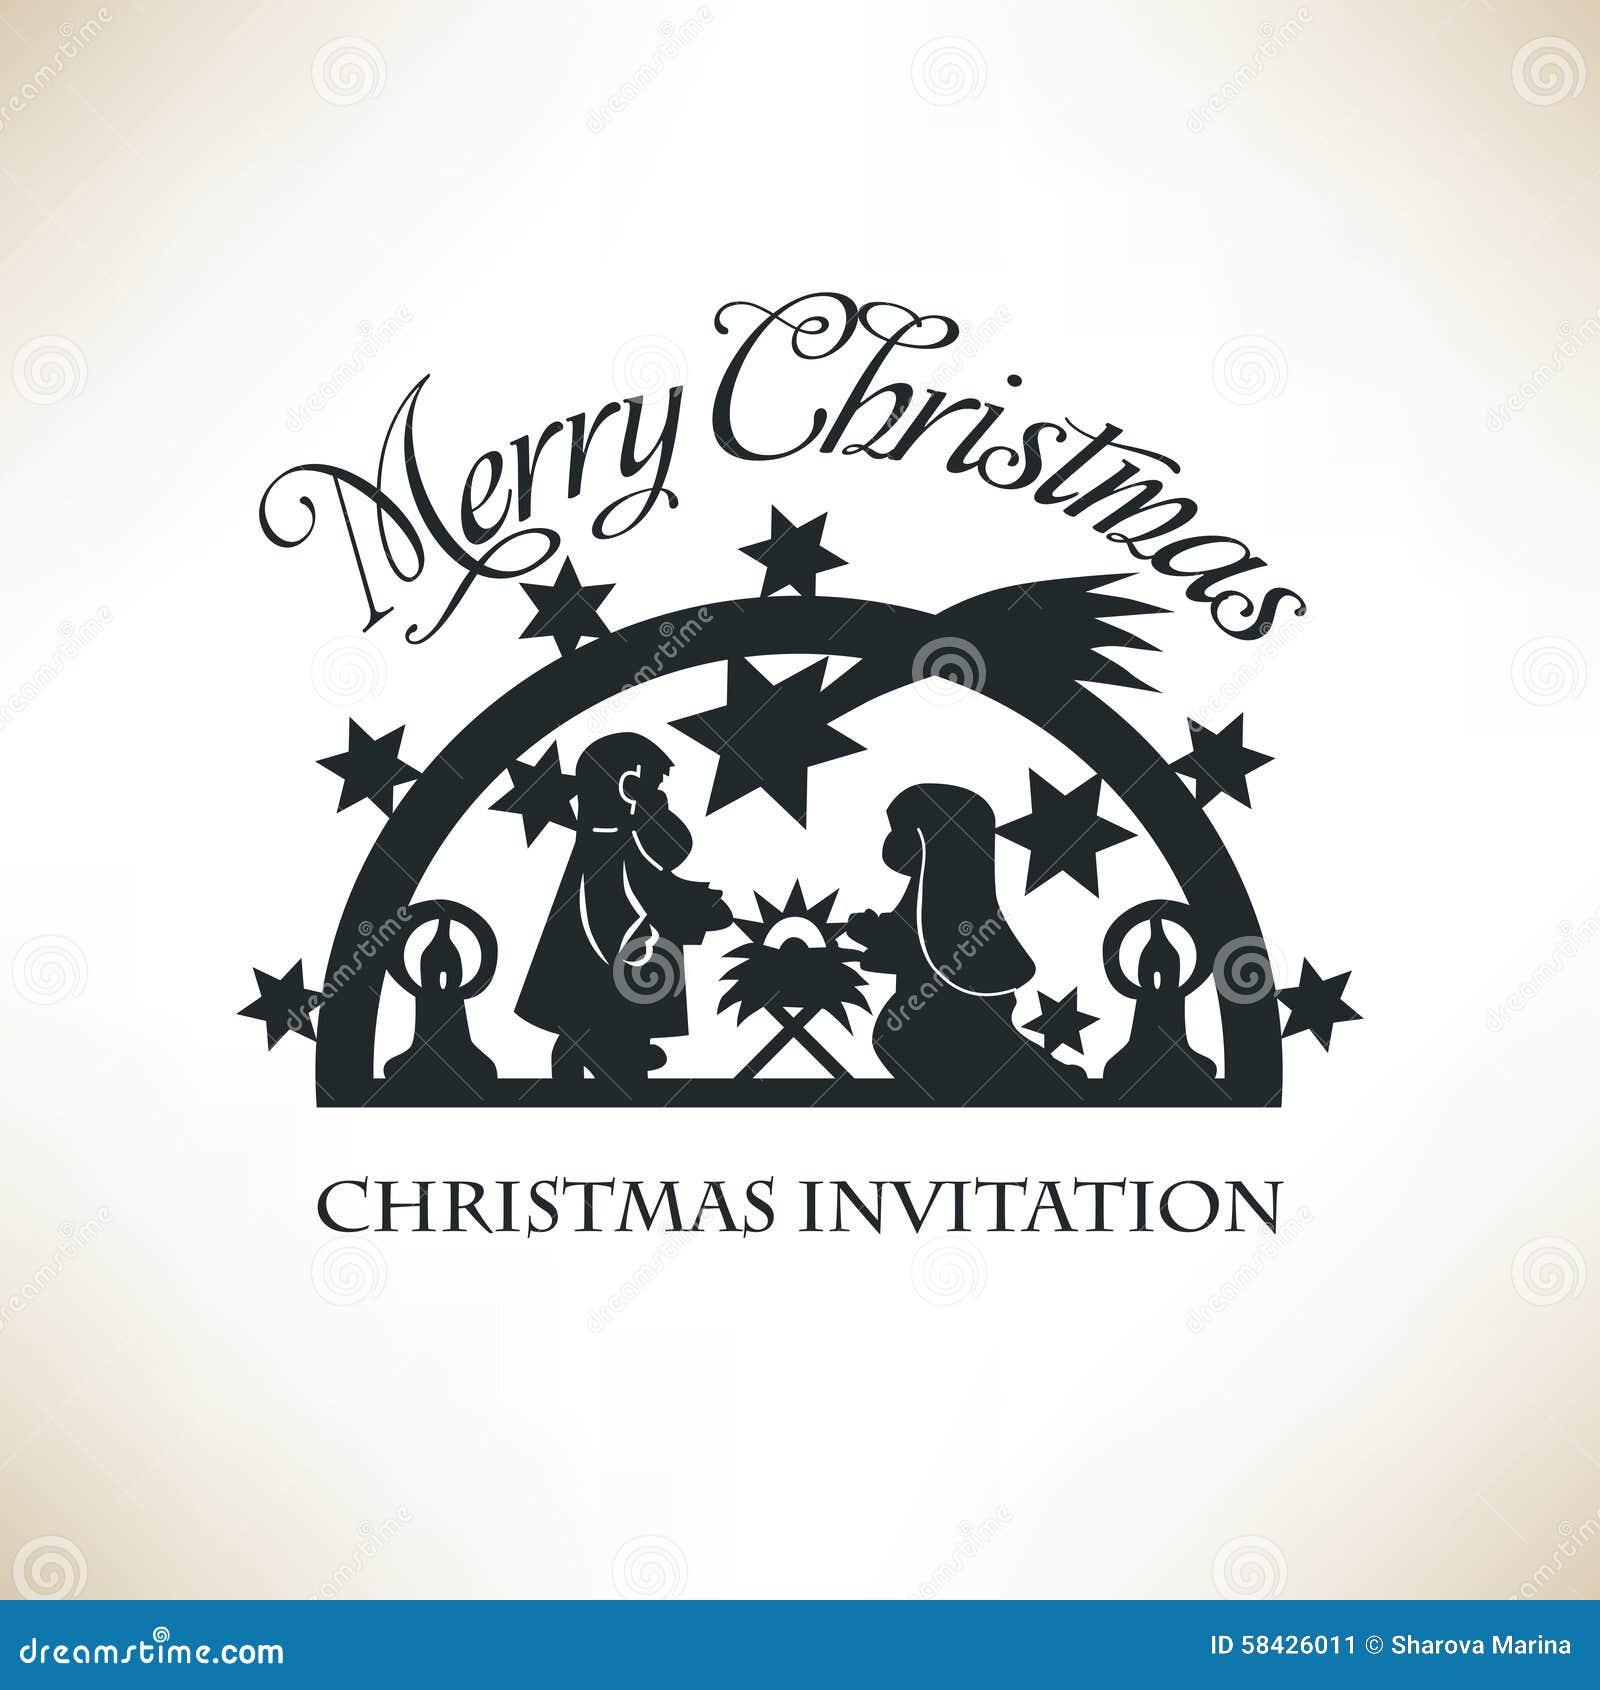 Einfache Geburt Christi-Szene Weihnachtseinladung Vektor Abbildung ...